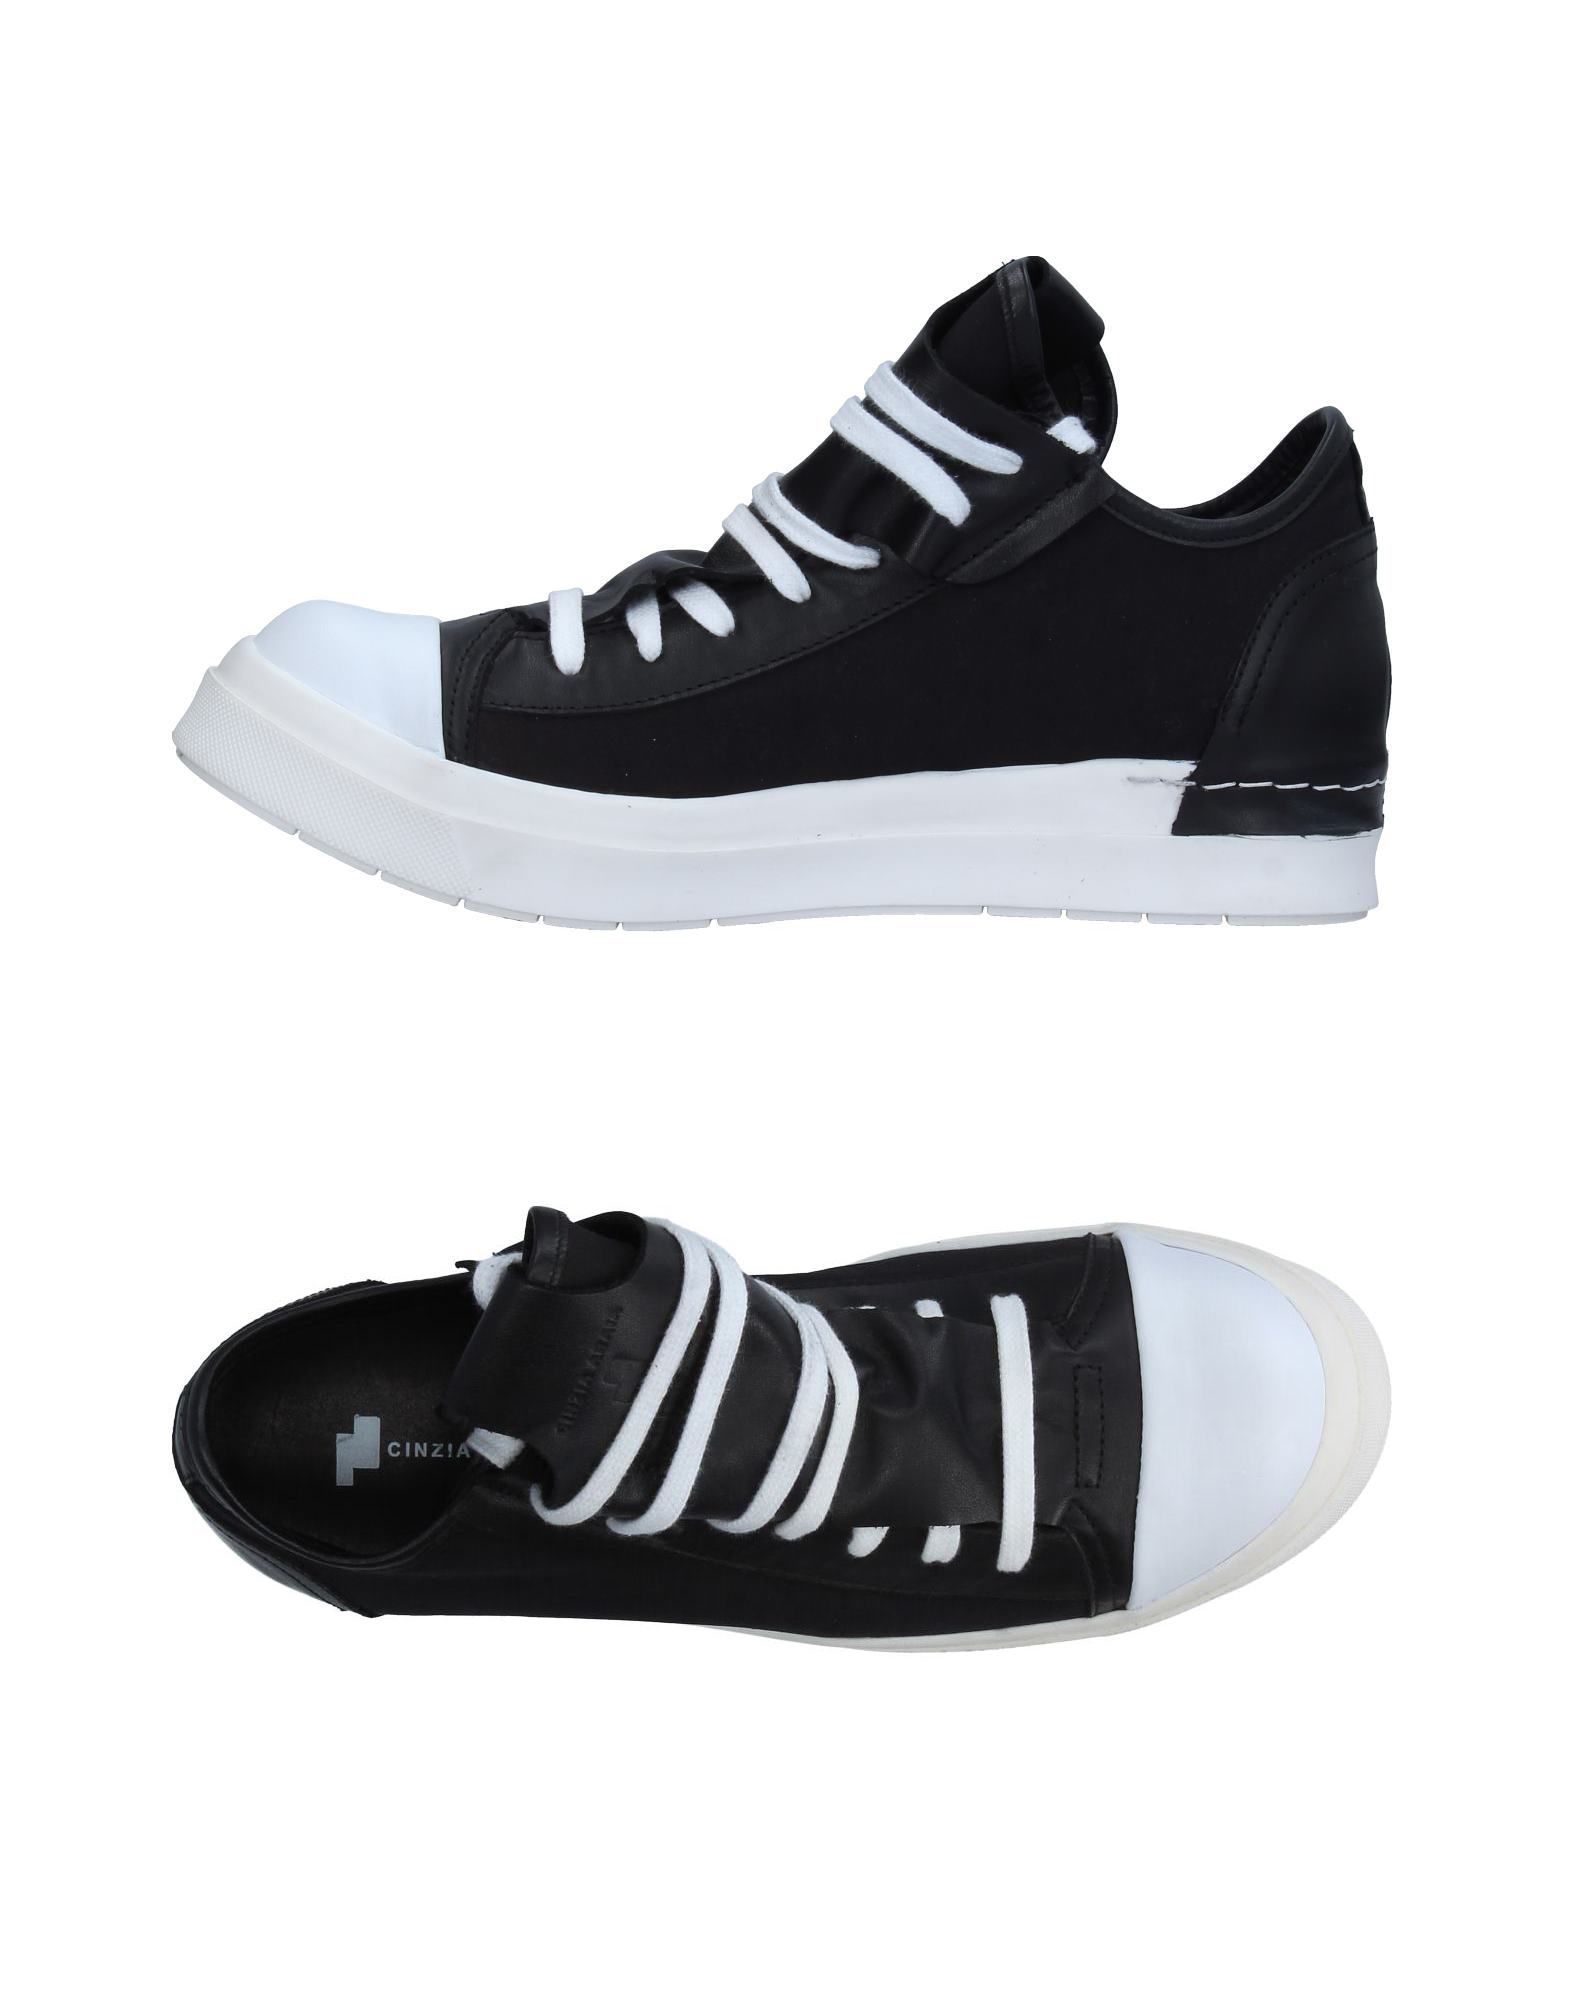 Cinzia Araia Sneakers Sneakers - Men Cinzia Araia Sneakers Sneakers online on  Canada - 11327605GW 9ea62a